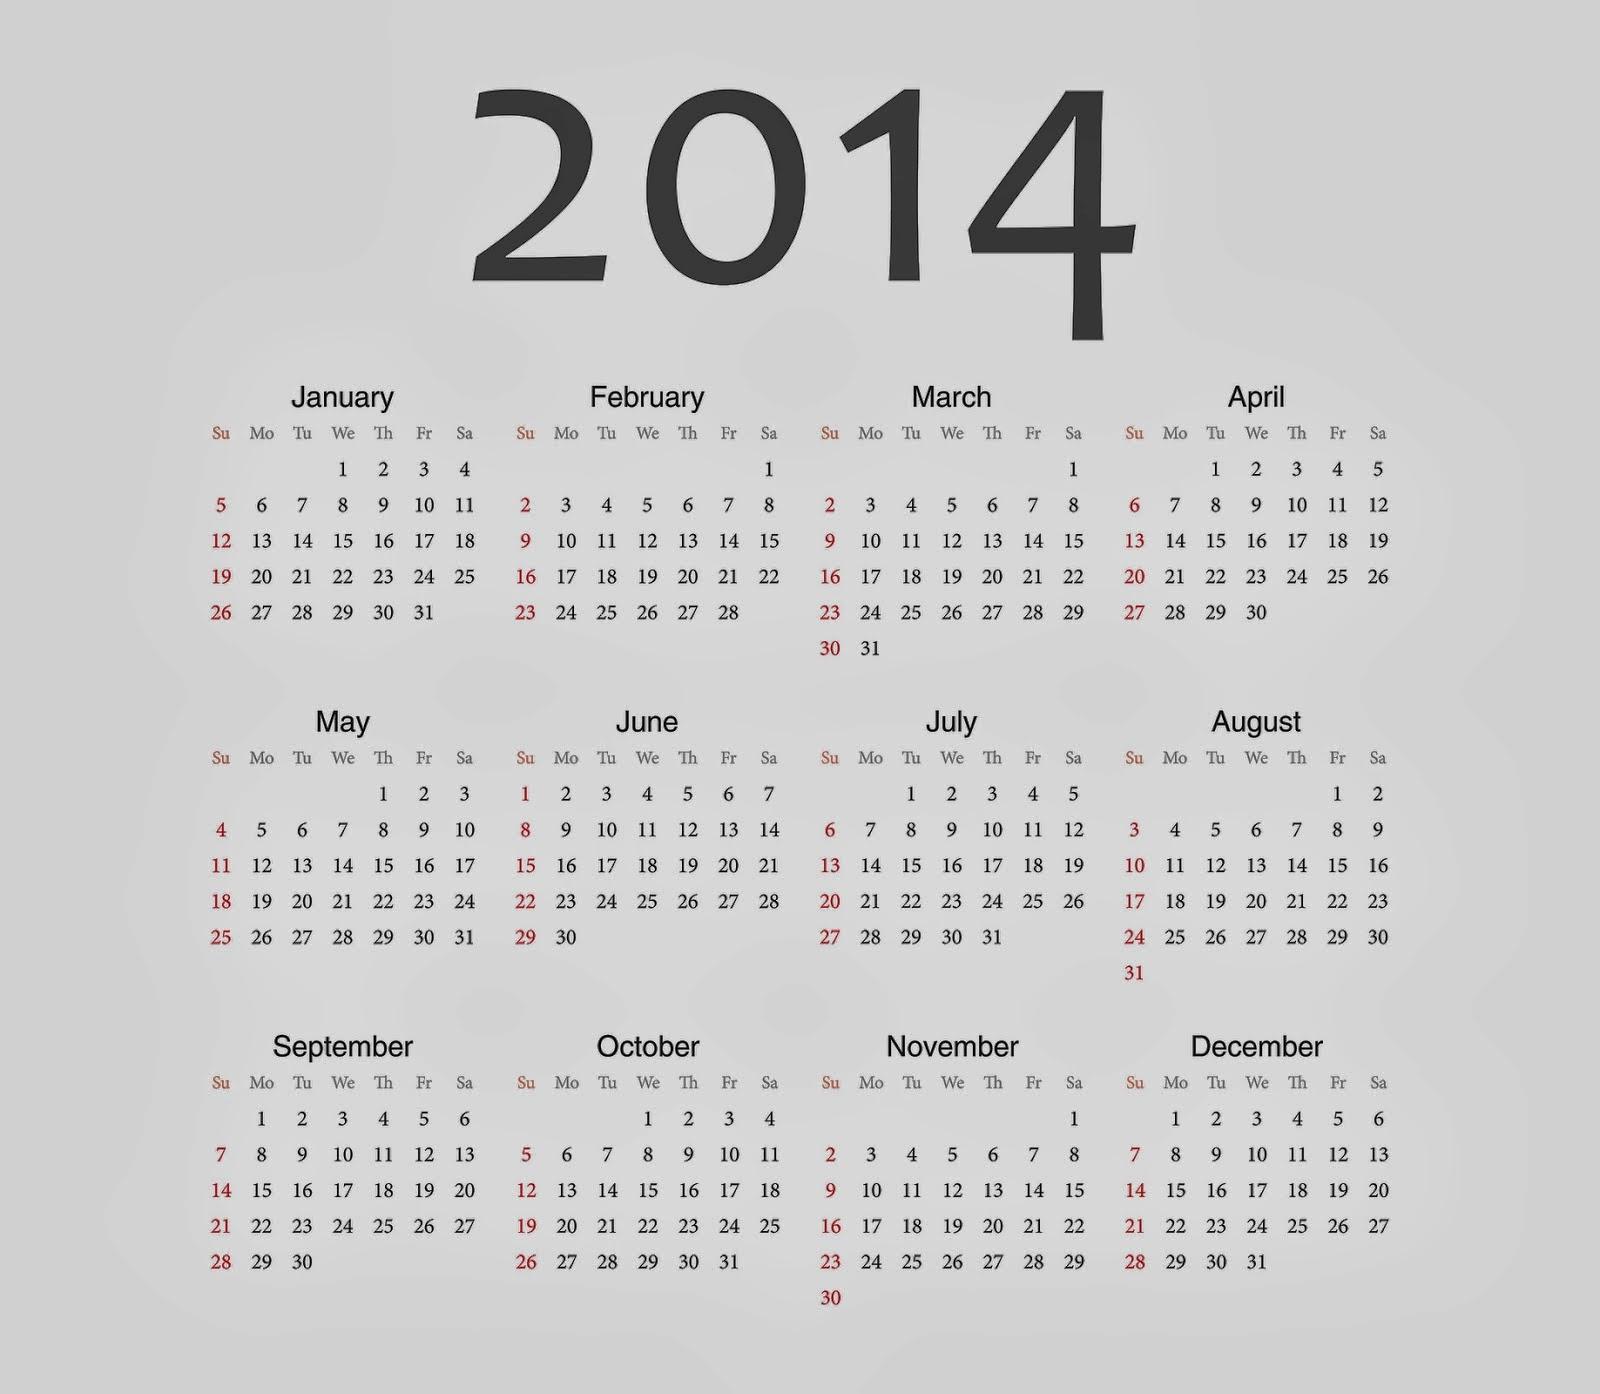 New Year 2014: New Year Calendar 2014 For Desktop